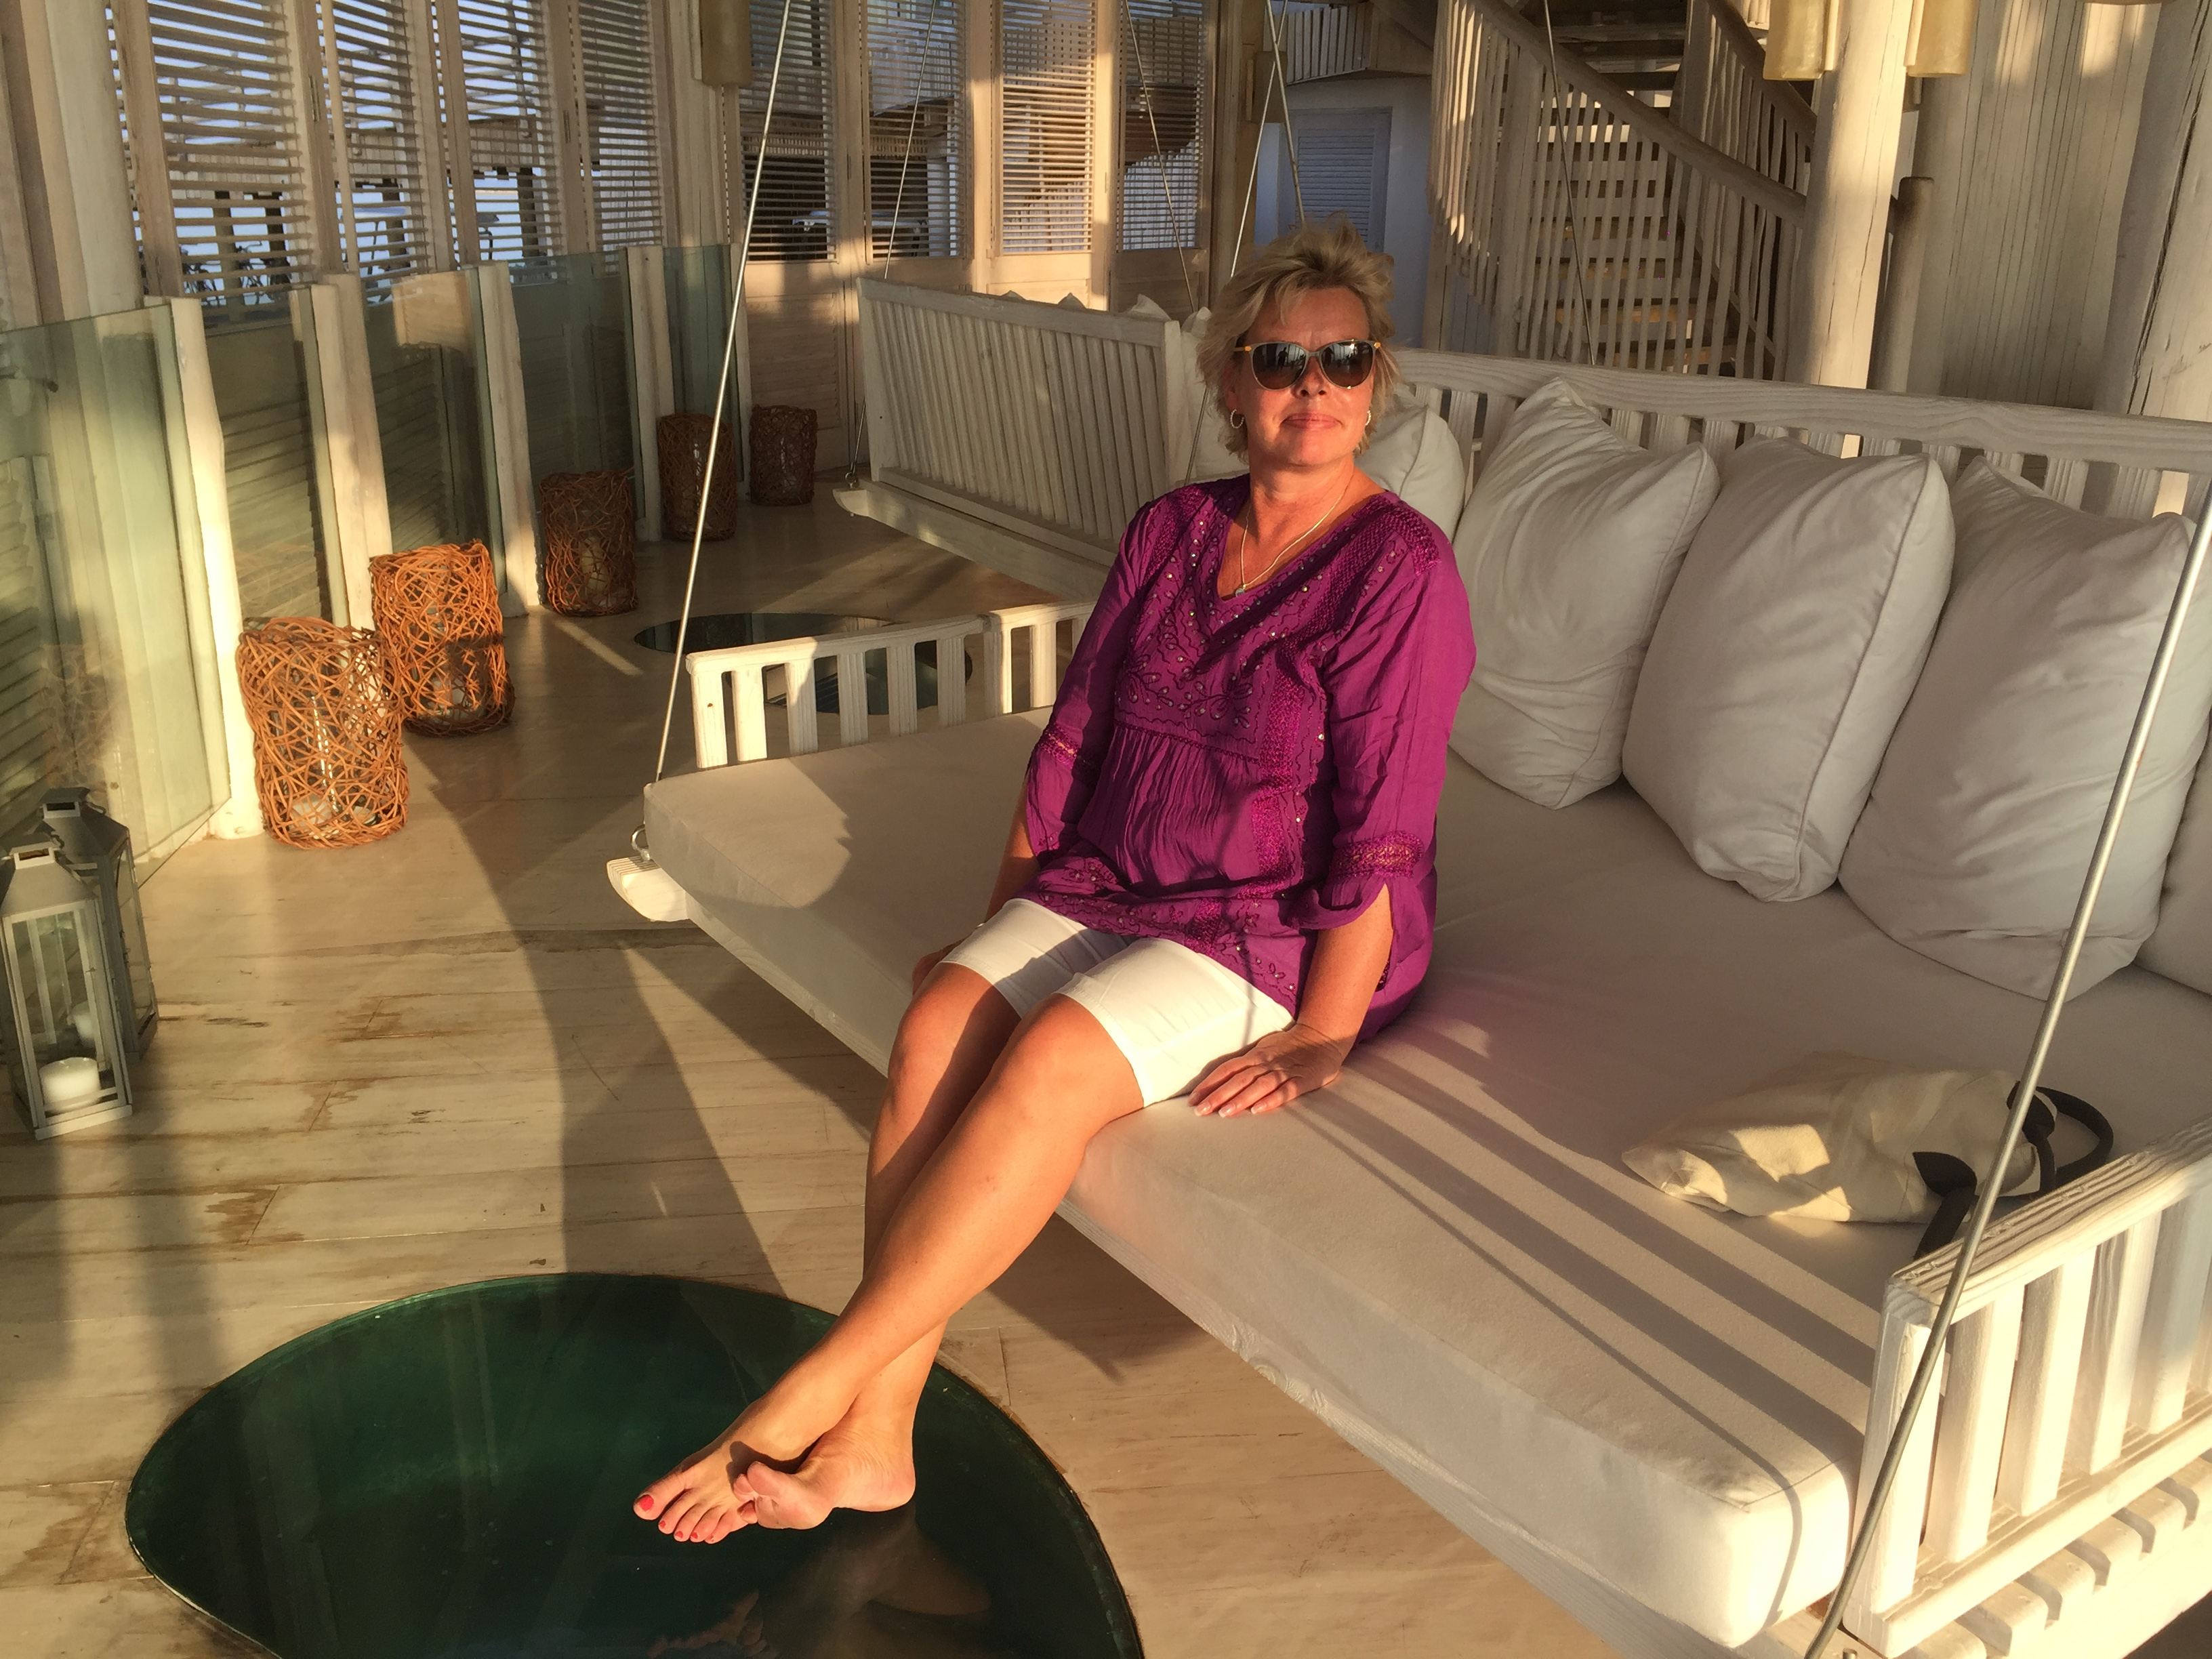 TUI-Berlin-Reisebüro-Malediven-Soneva-Jani-Luxusresort-Reisebericht-am-Strand